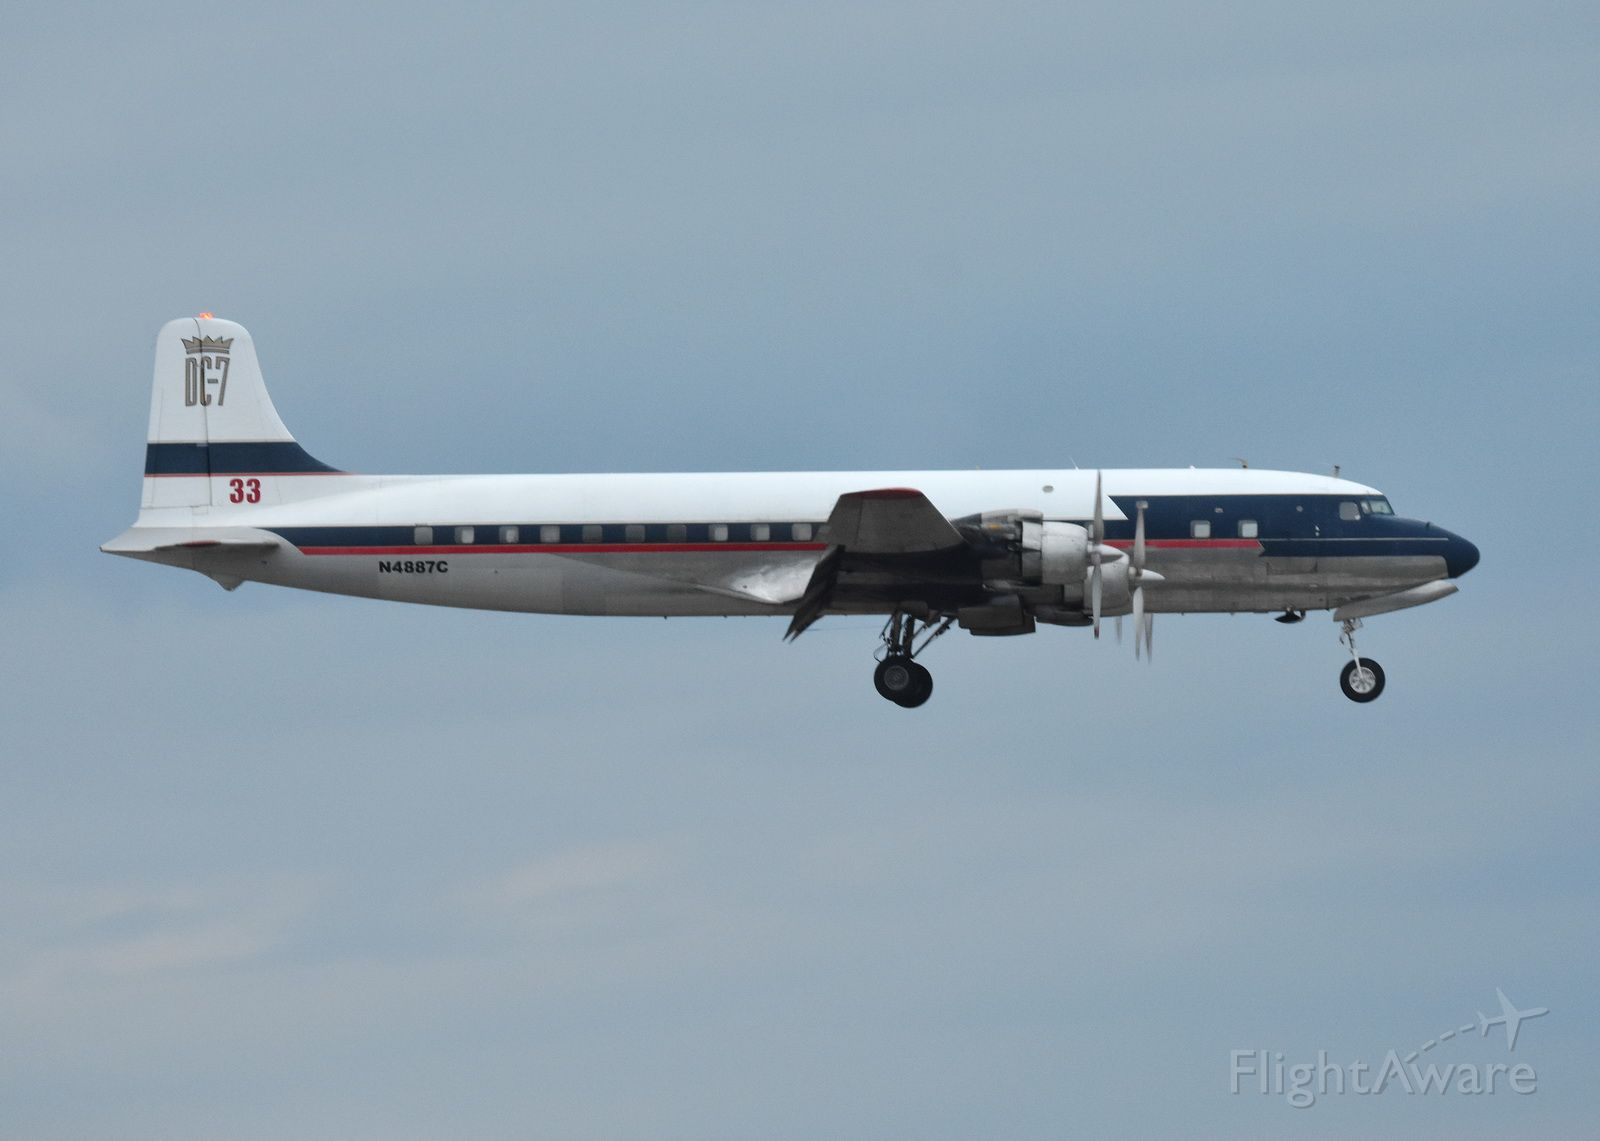 Douglas DC-7 (N4887C) - N4887C Douglas DC-7B makes it's final landing at Hartsfield-jackson International airport after a long awaited ferry flight. 11/17/2019